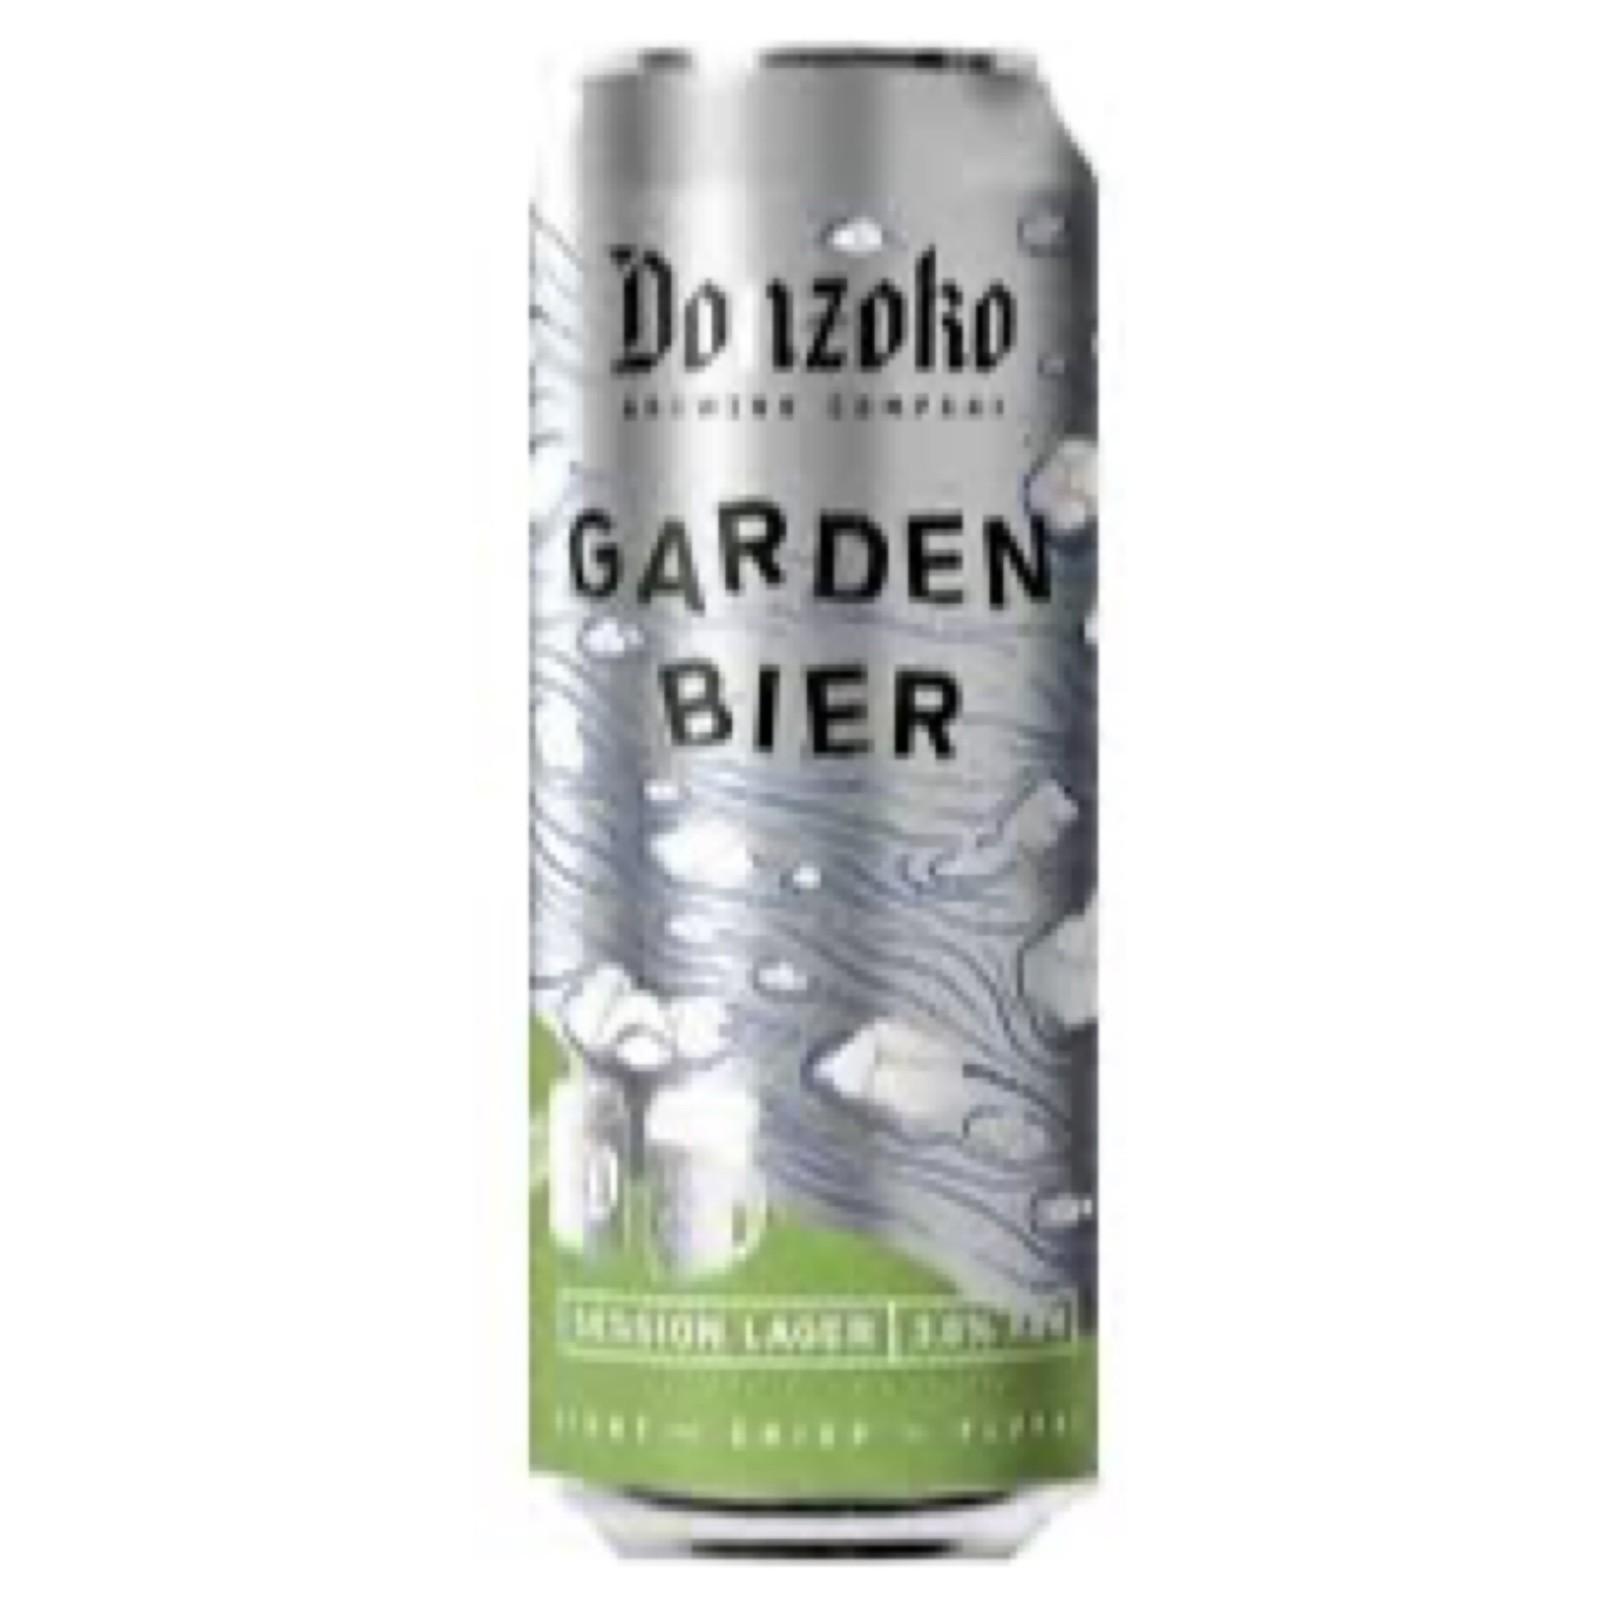 Garden Bier Session Lager 3.8% 500ml Donzoko Brewing